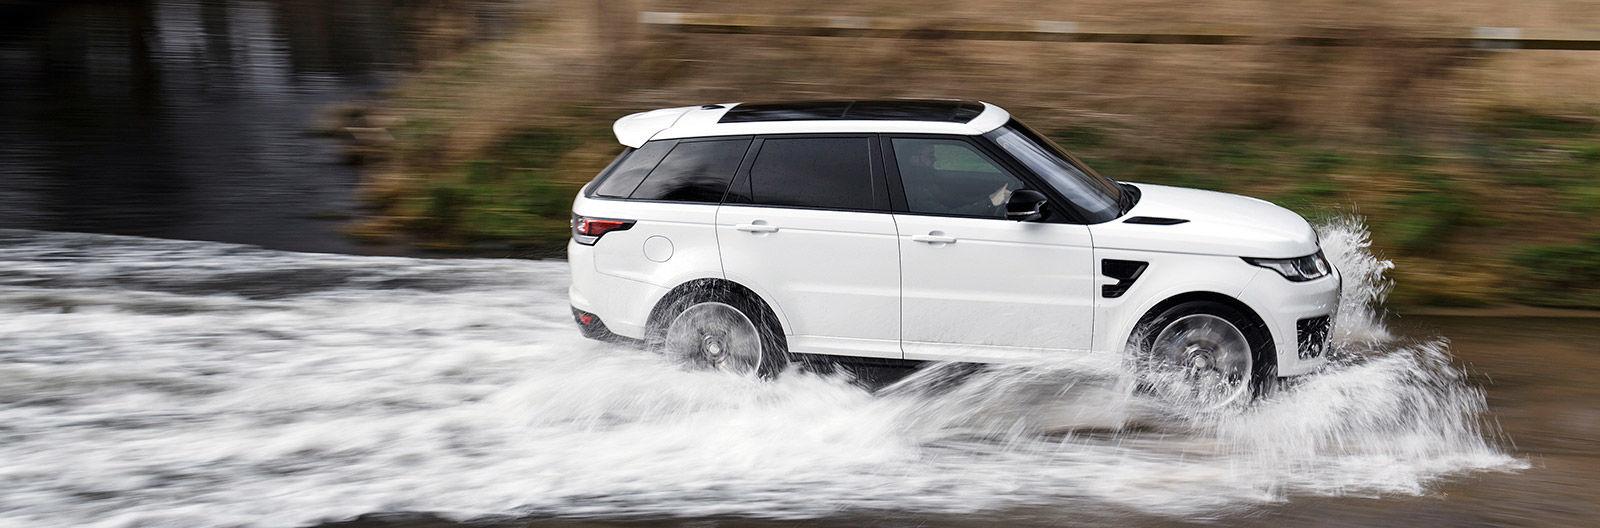 High Quality 3 U2013 Range Rover Sport SVR